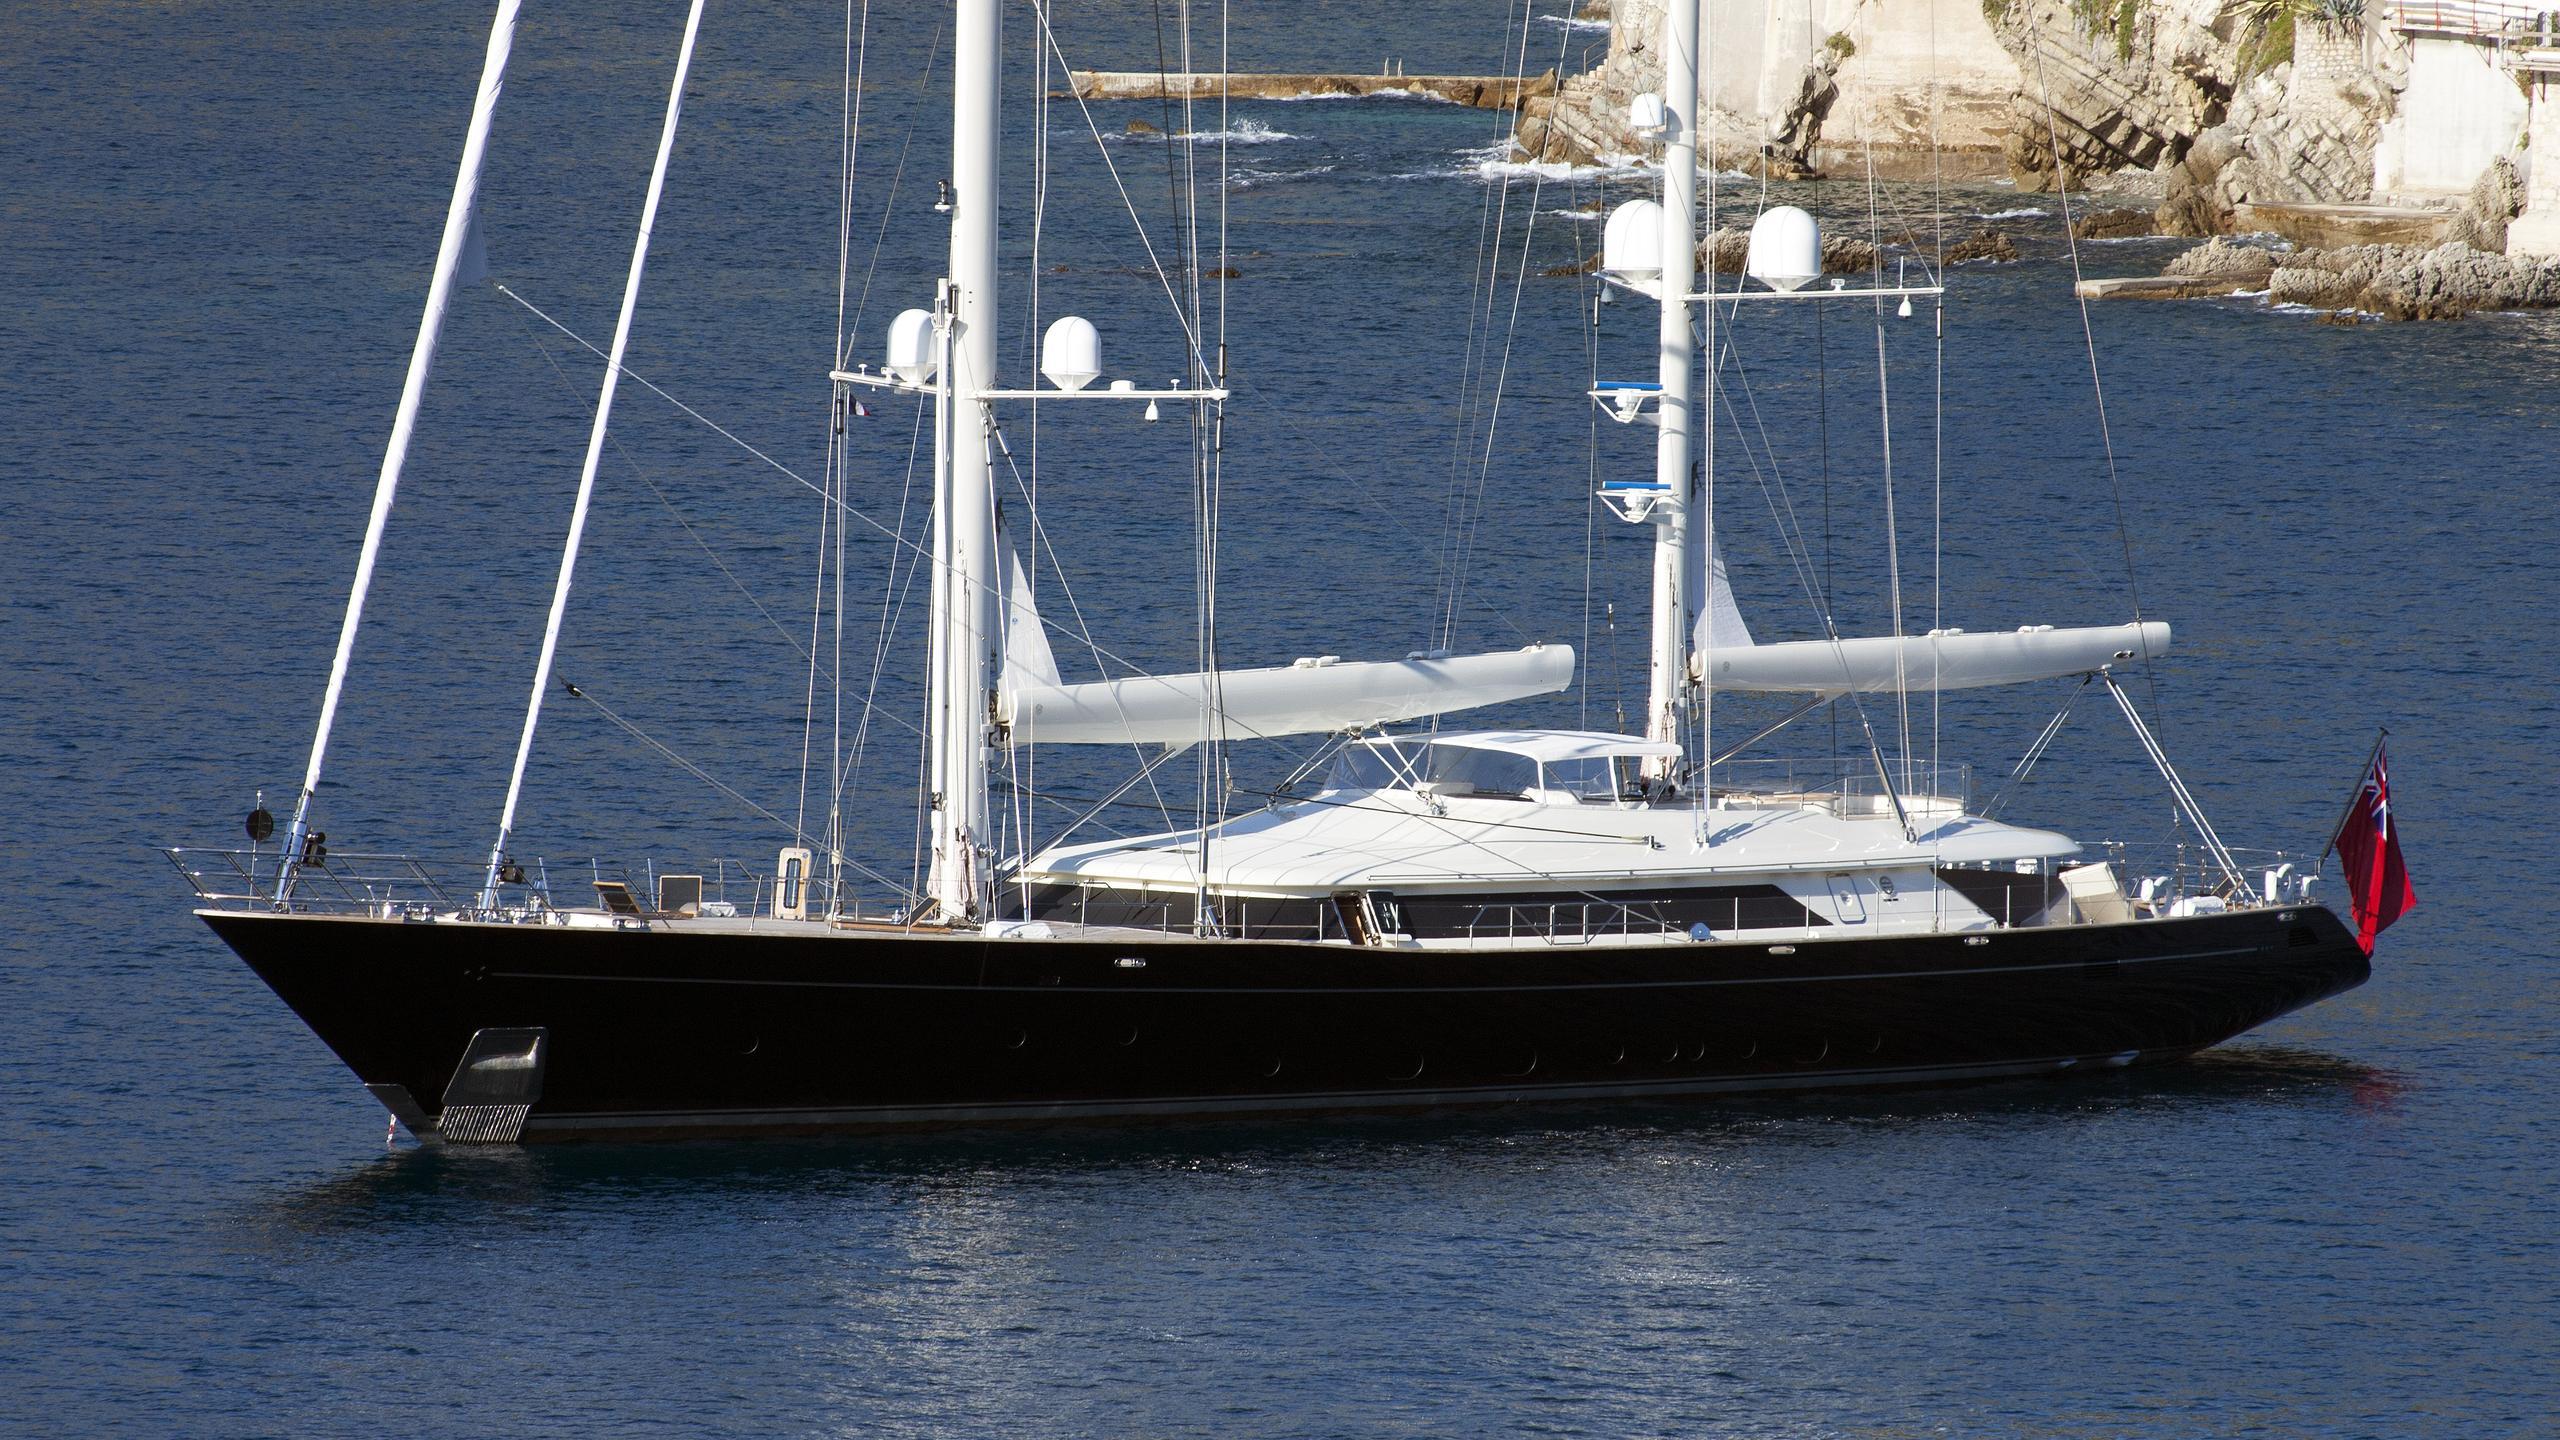 asahi-sailing-yacht-perini-navi-2009-56m-profile